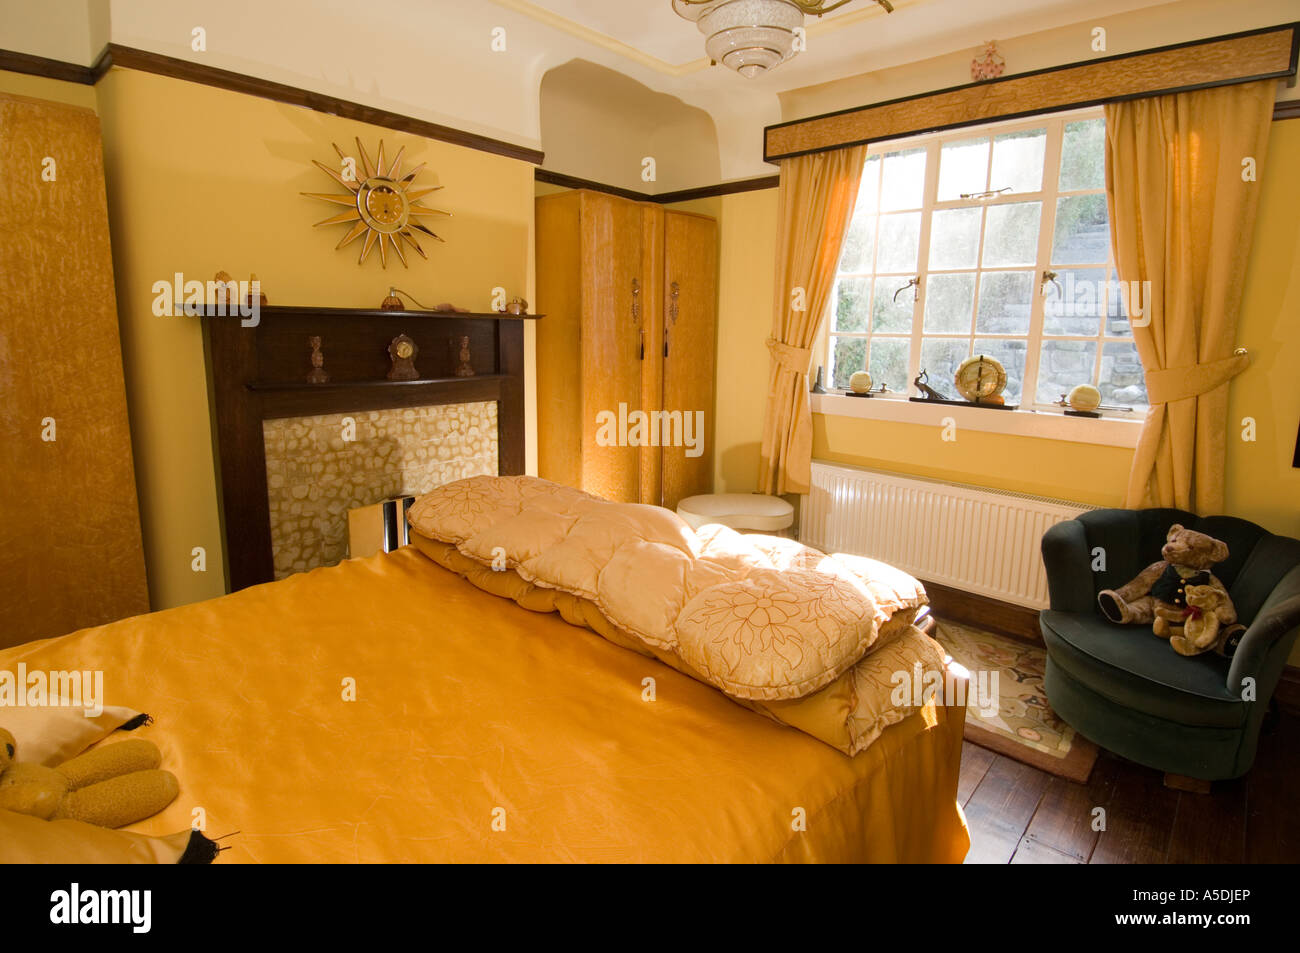 Refurbished art deco art nouveau 1930 s house interior for Art nouveau interior design bedroom